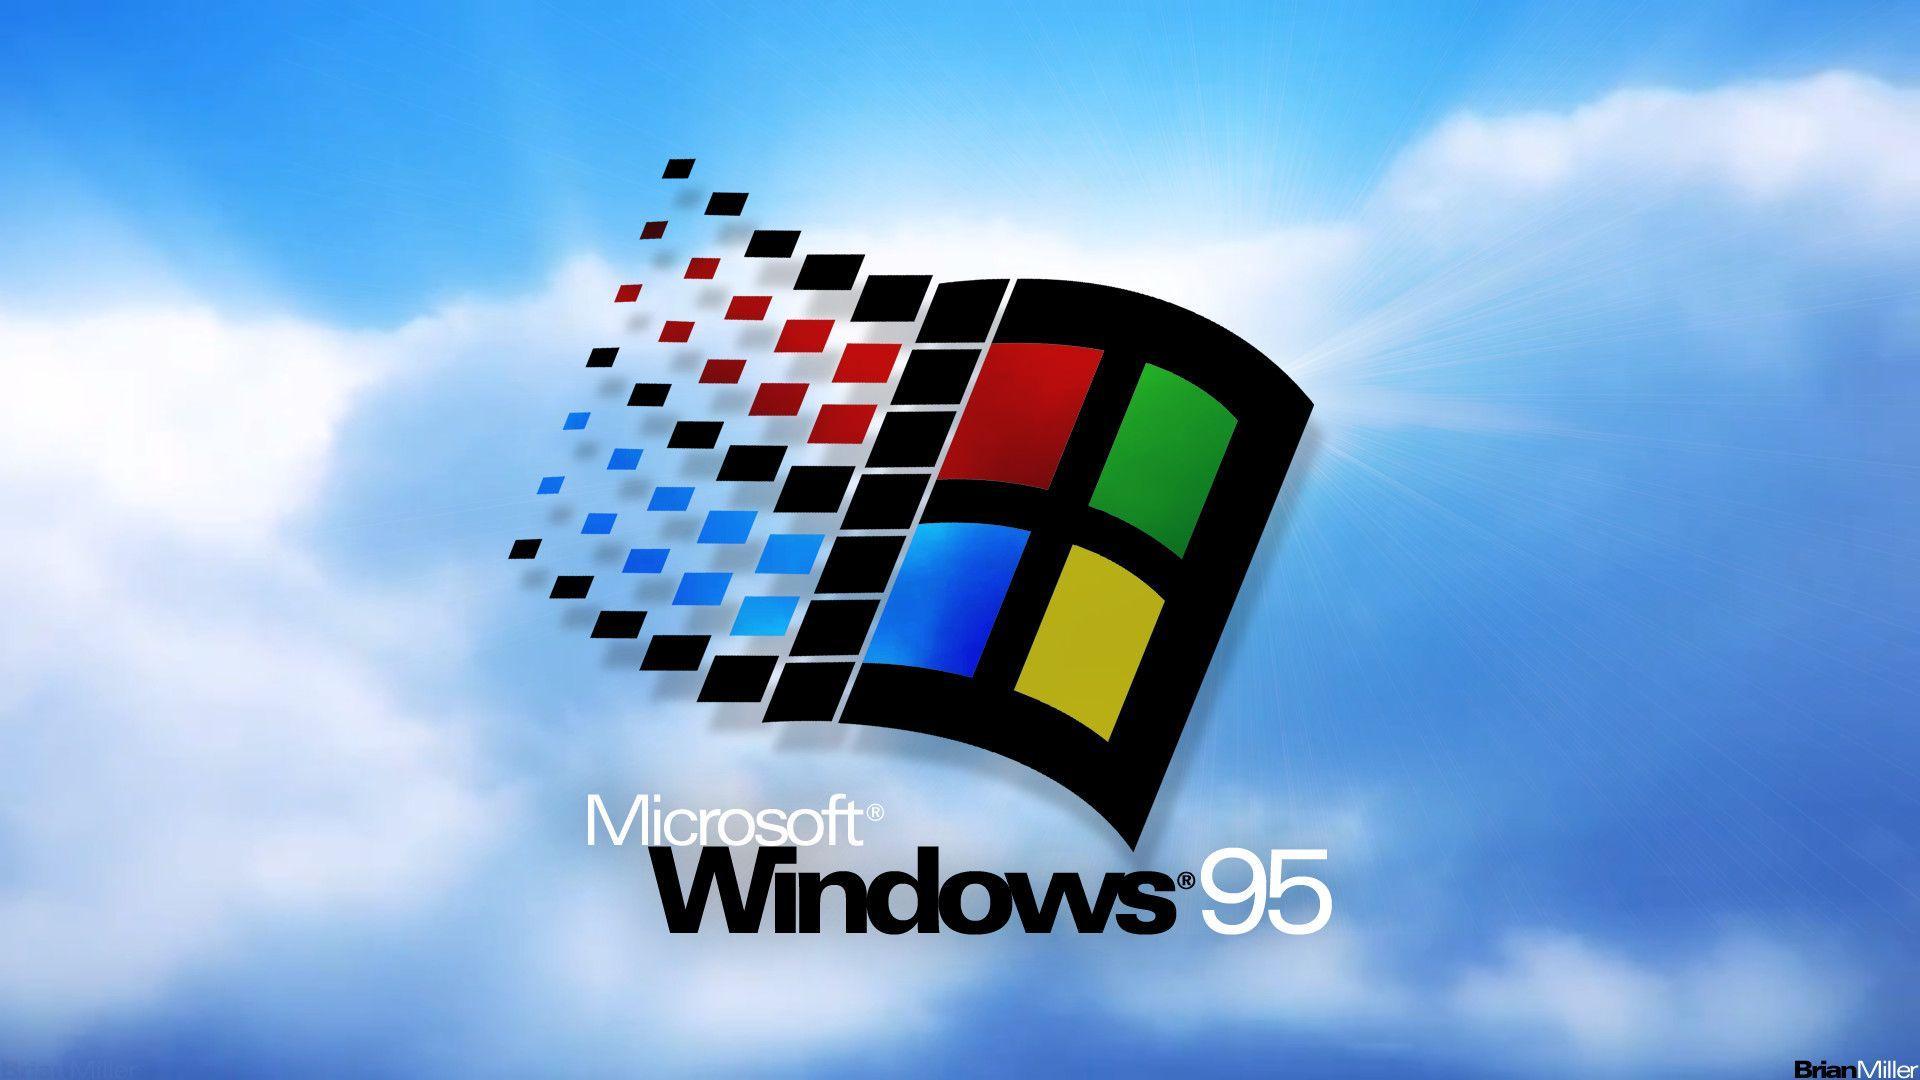 Windows 95 Wallpapers Hd Wallpaper Cave